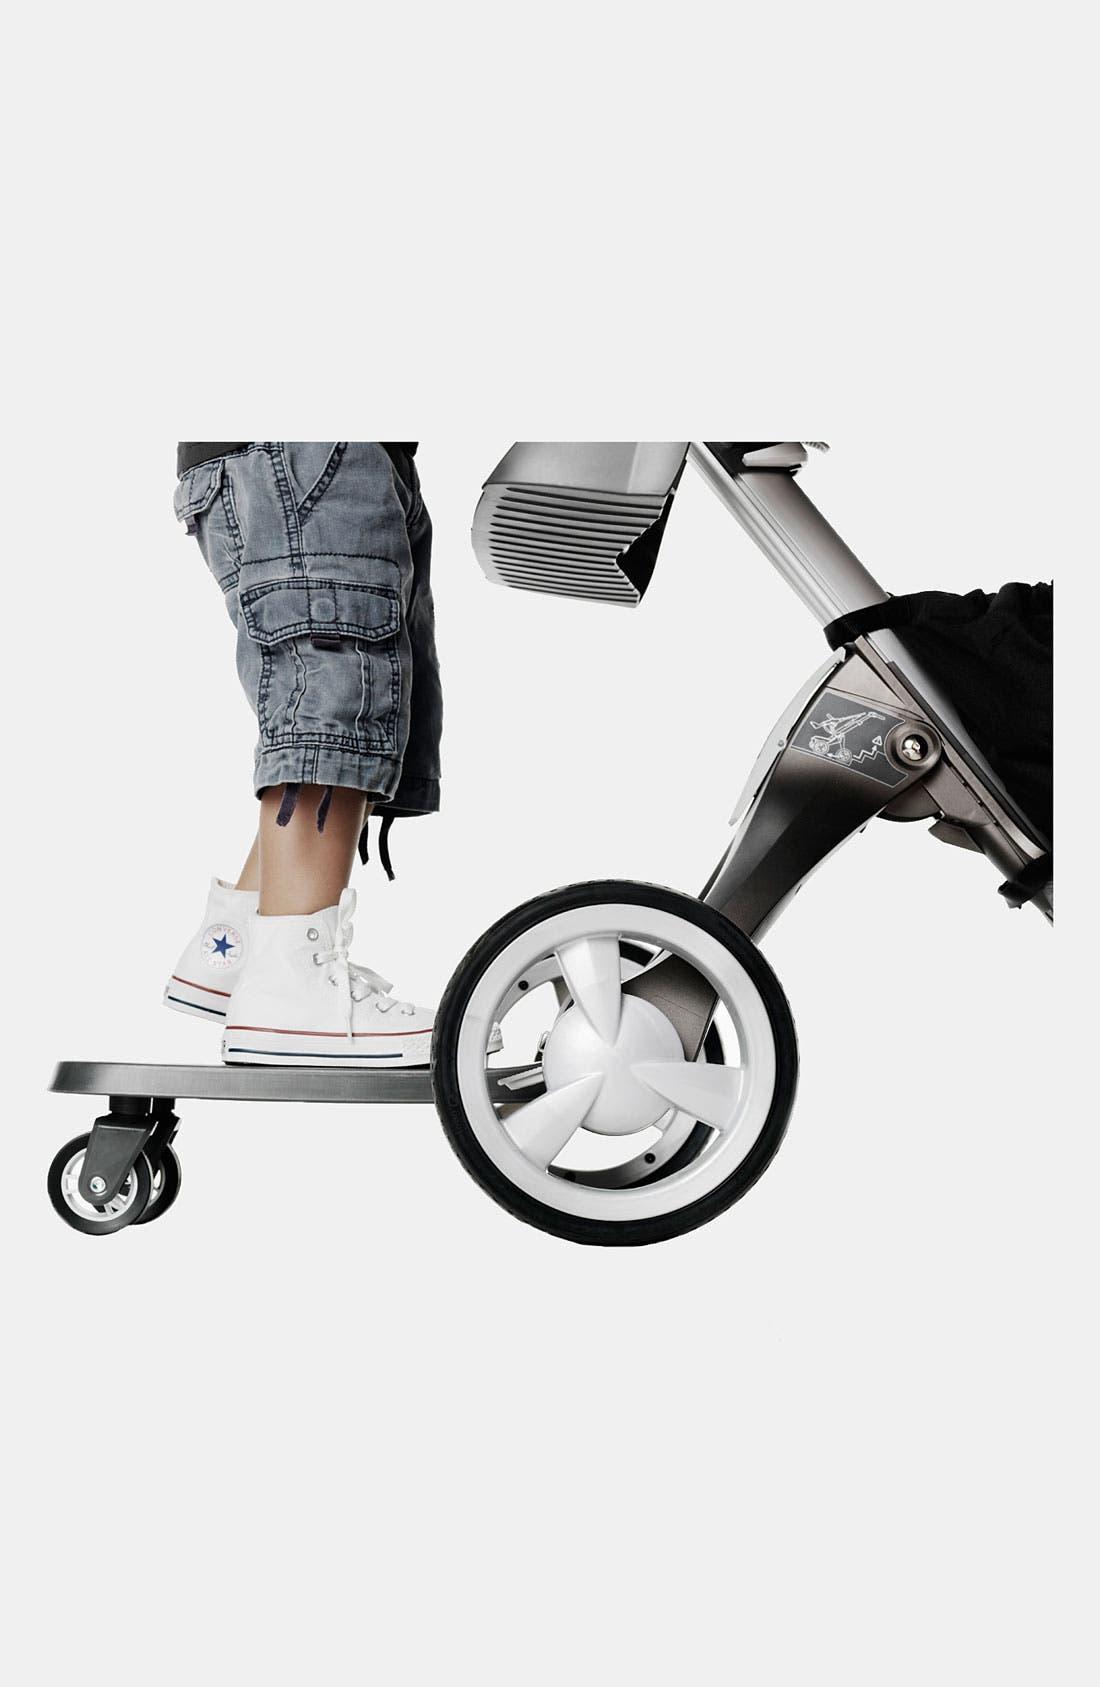 Alternate Image 1 Selected - Stokke 'Xplory®' Stroller Rider